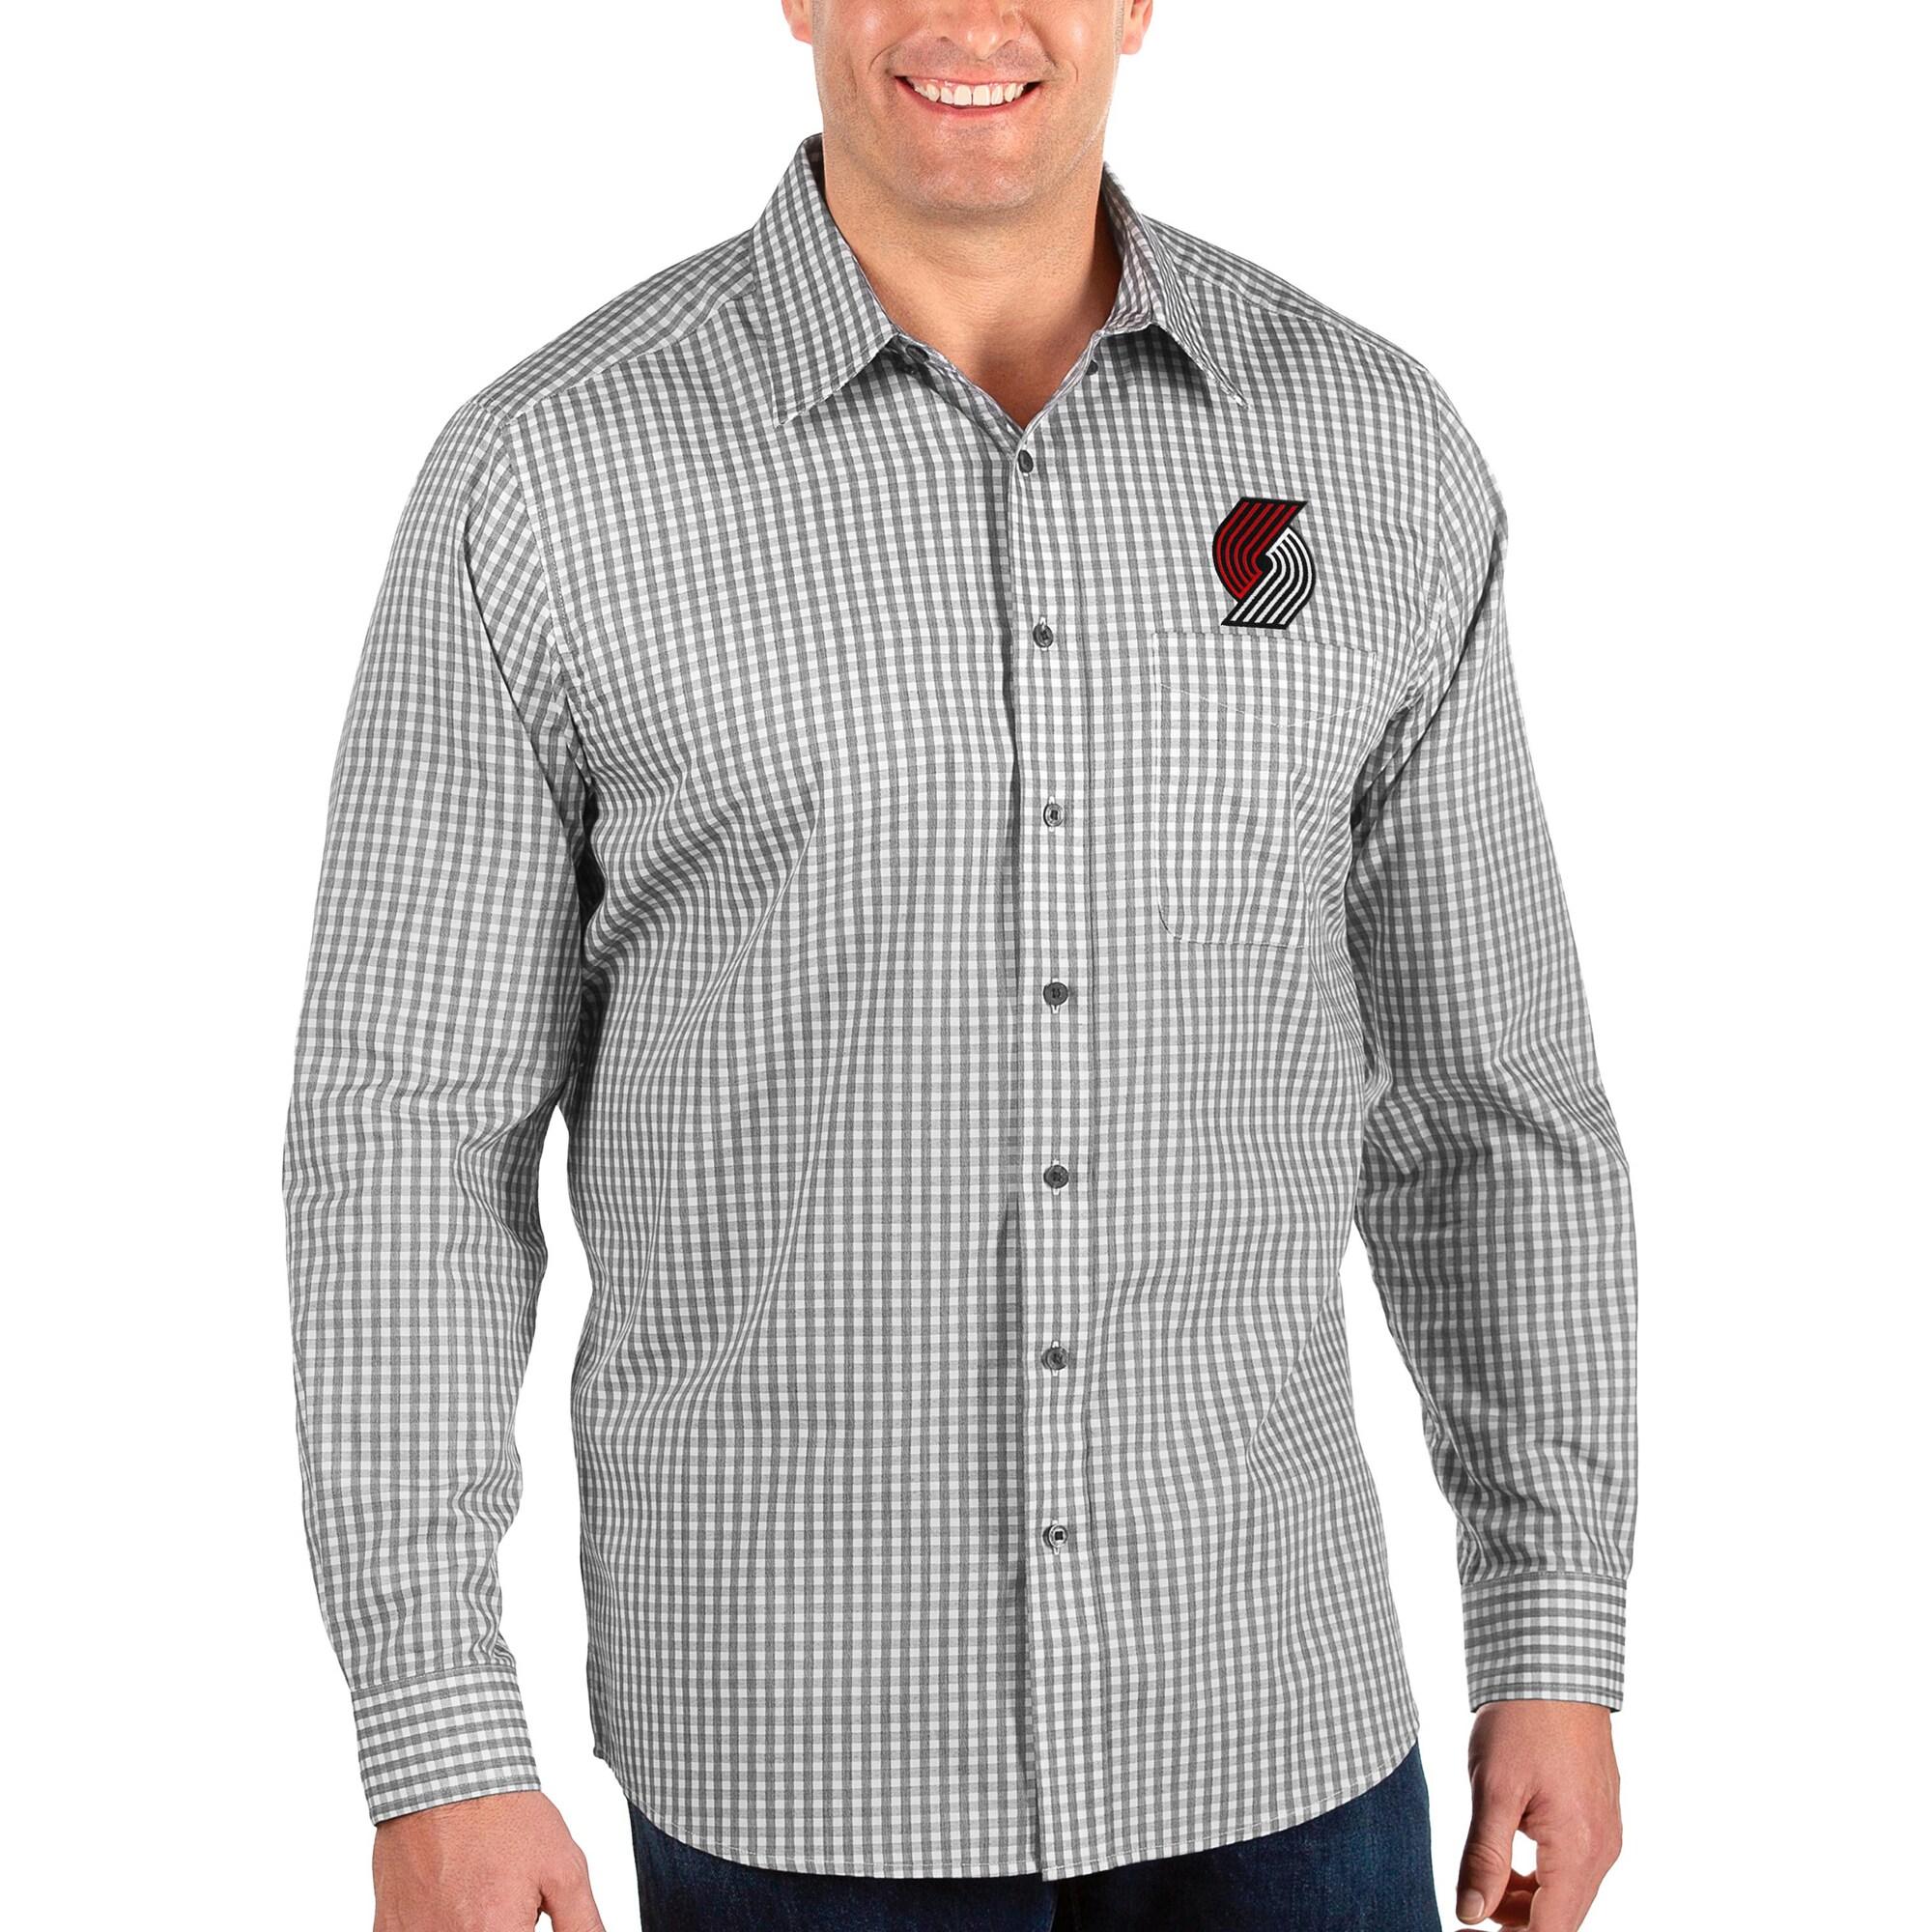 Portland Trail Blazers Antigua Big & Tall Structure Long Sleeve Button-Up Shirt - Black/White